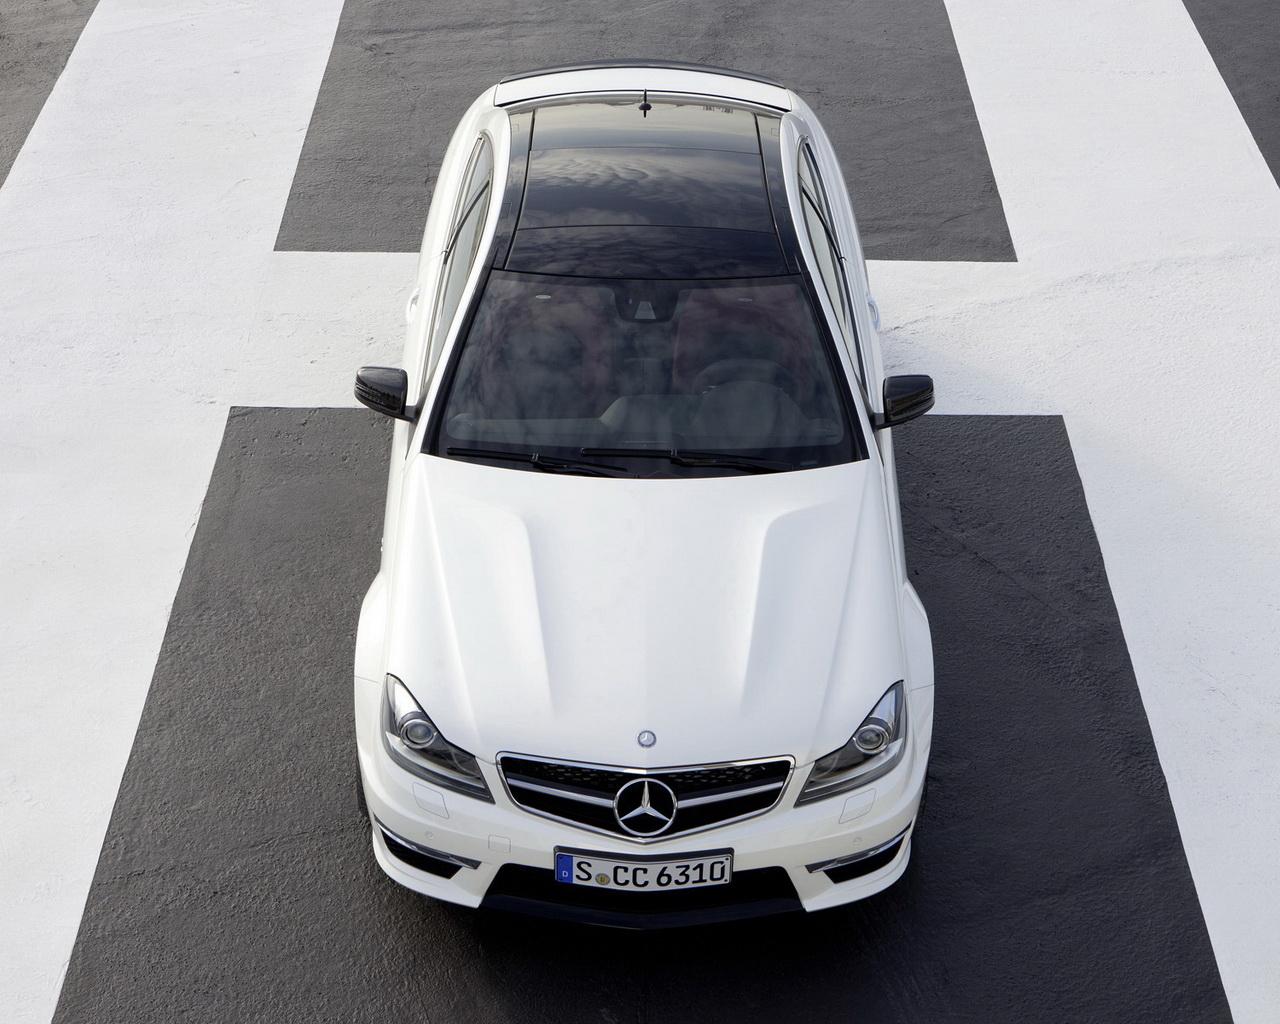 http://2.bp.blogspot.com/-ZcrM1j22cL8/TgpITzKerRI/AAAAAAAADoA/2D-X2-D6esc/s1600/Mercedes-Benz-C-63-AMG-Coupe-wallpaper.jpg